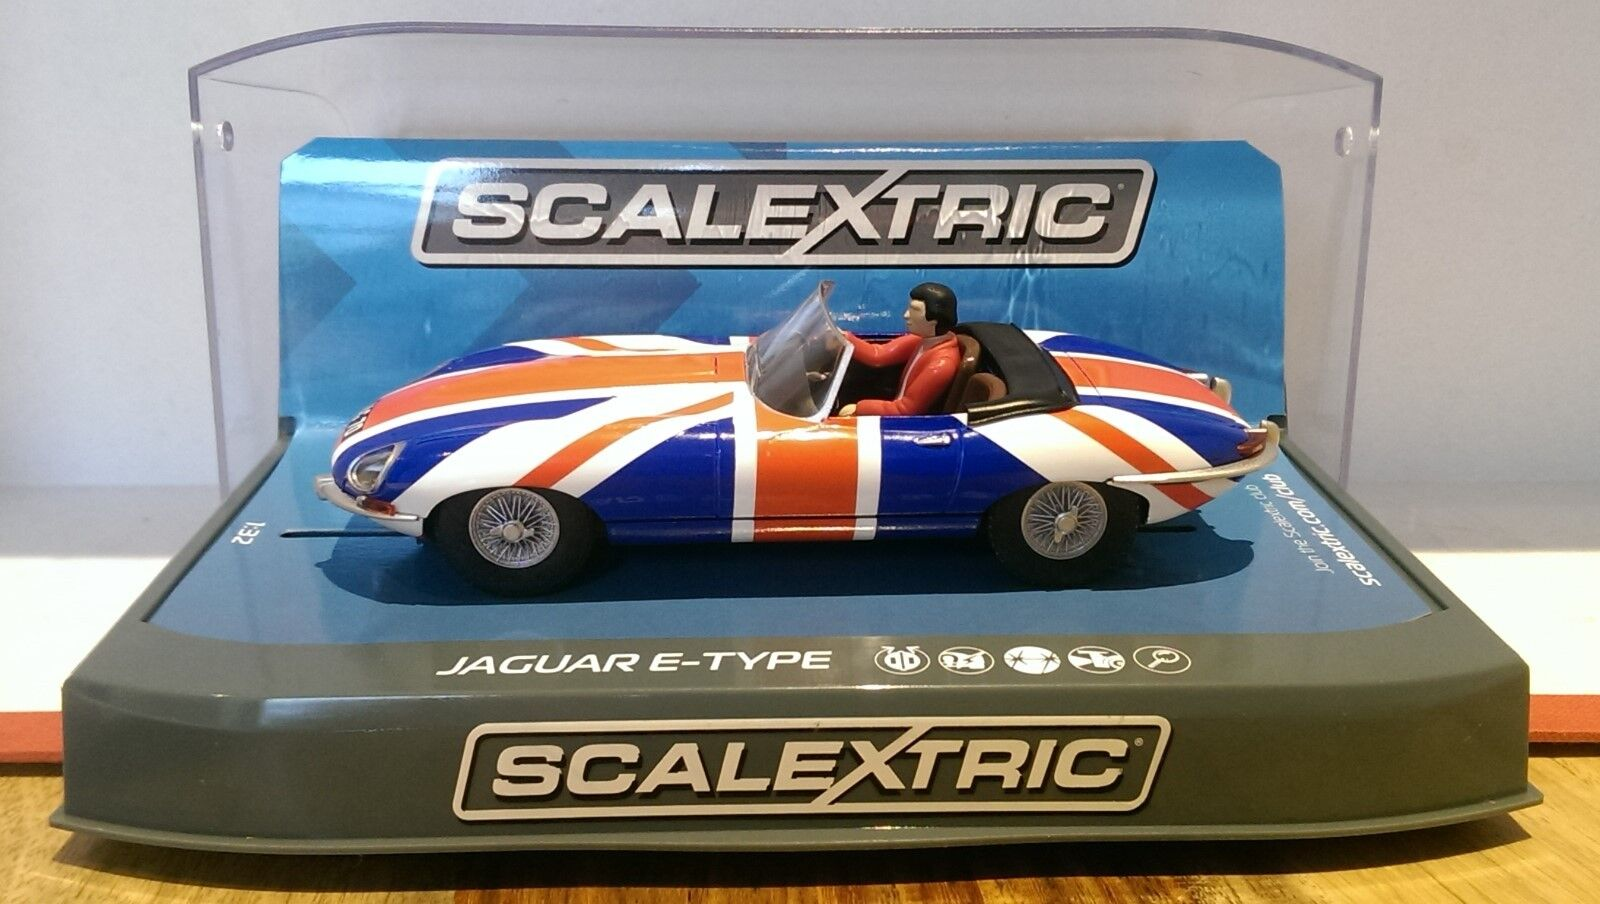 SCALEXTRIC C3878 Jaguar E-Type Union Flag Livery